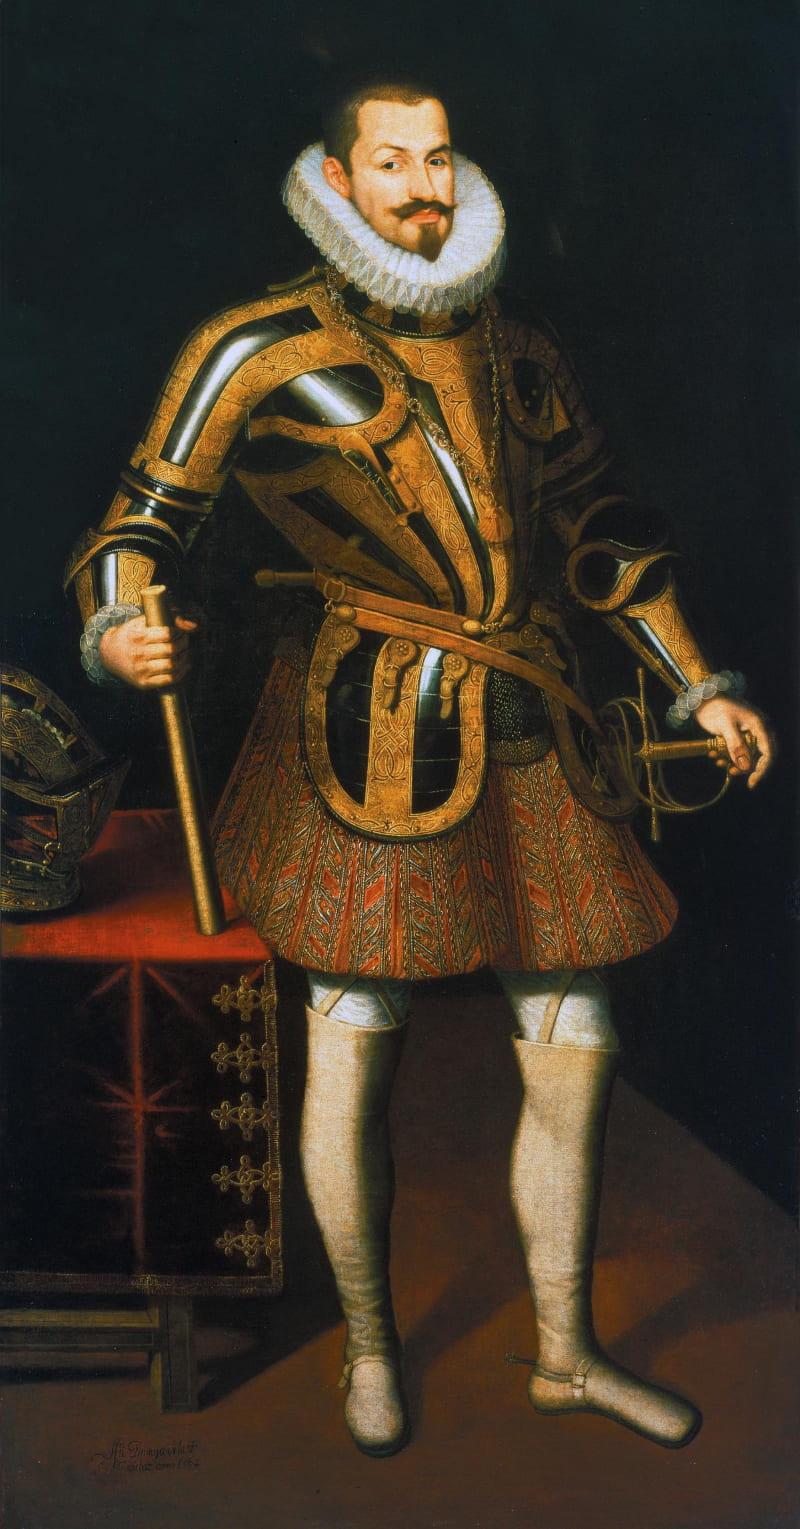 Хуан Карреньо де Миранда «Портрет герцога Лермы»